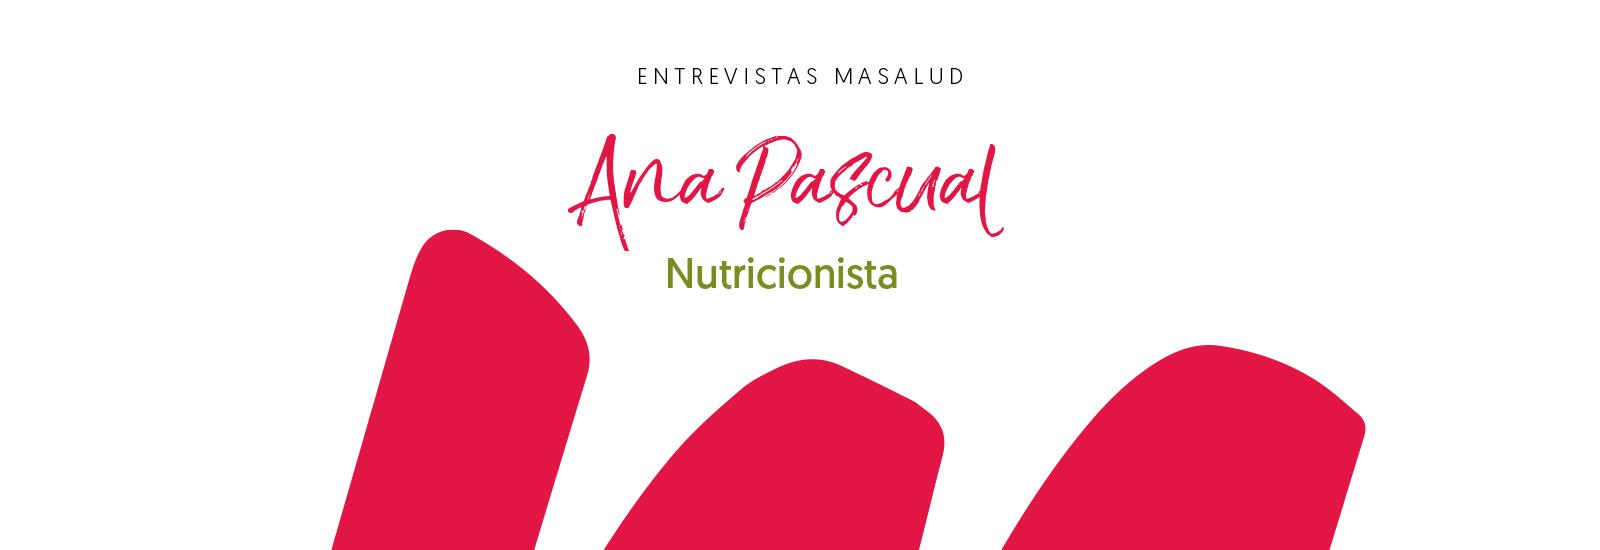 Ana Pascual  Nutricionista